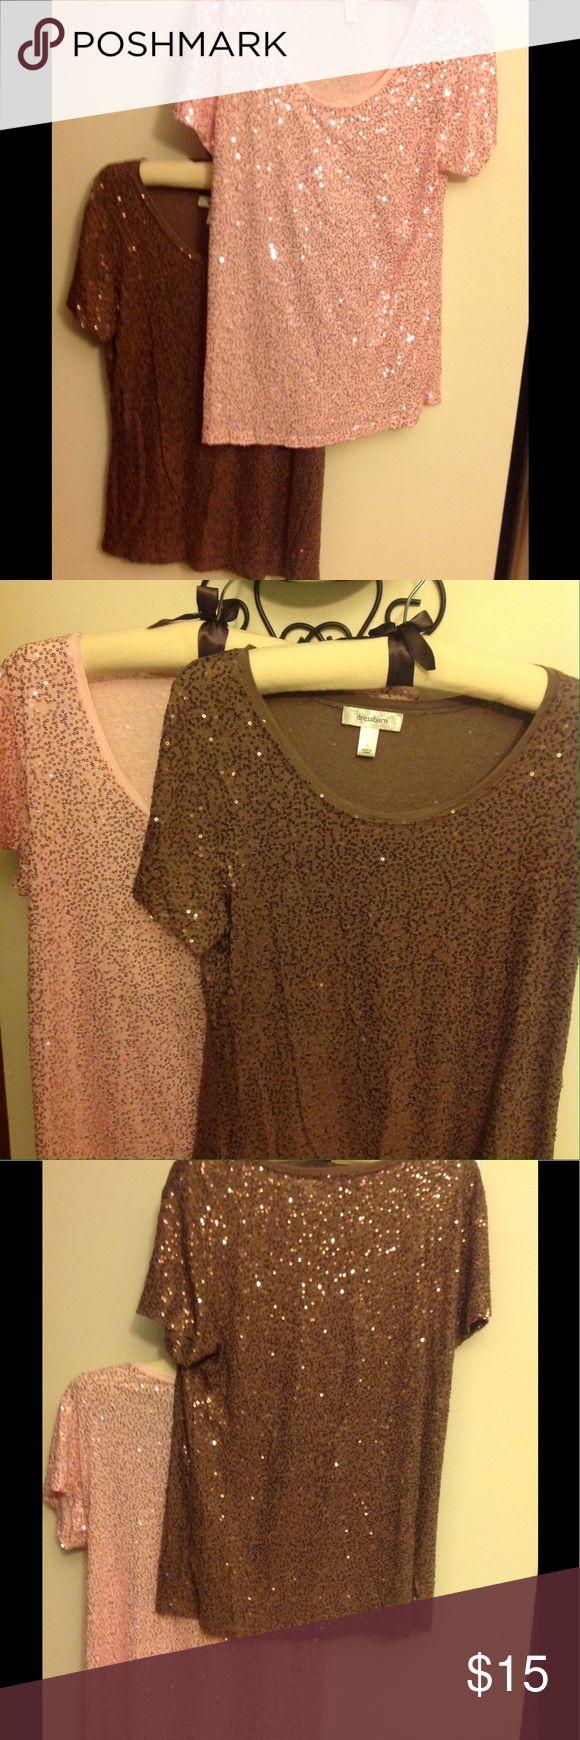 2 New Dress Barn Short Sleeve Sequin Tops Sz Large 2 New Dress Barn Short Sleeve Casual Sequin Tops Size Large Pink & Brown Dress Barn Tops